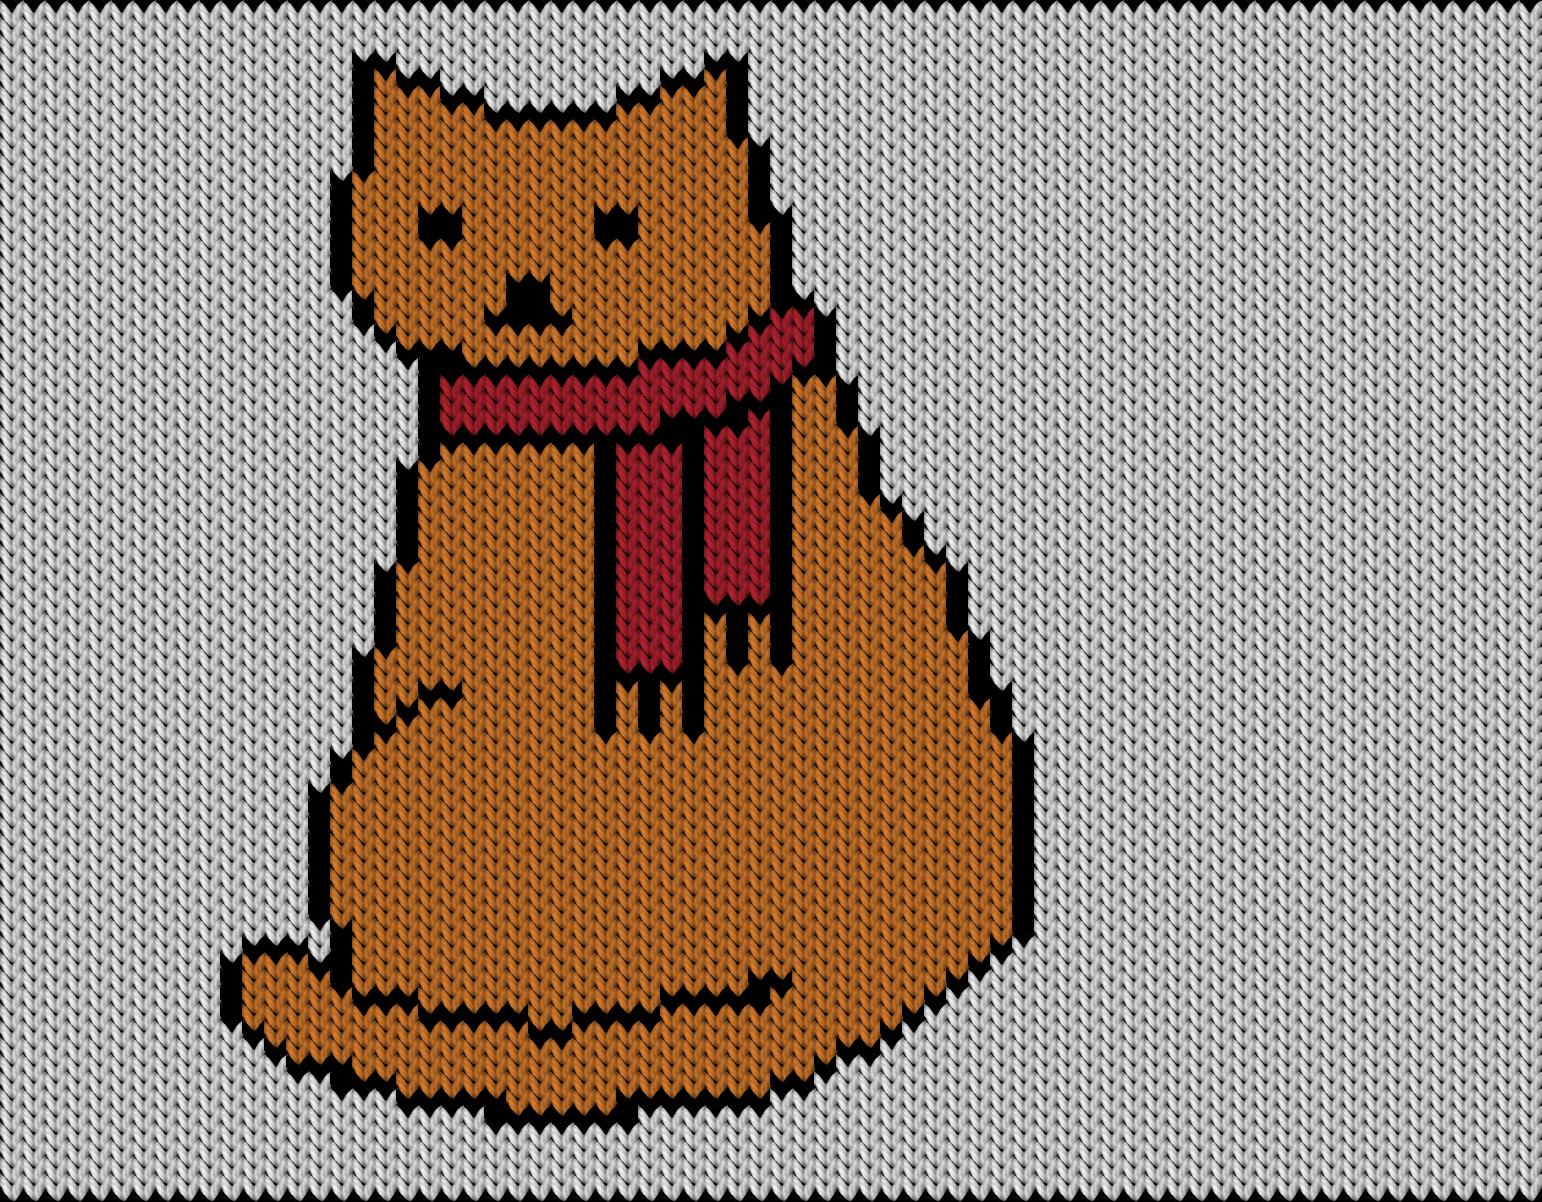 Knitting motif chart, winter cat